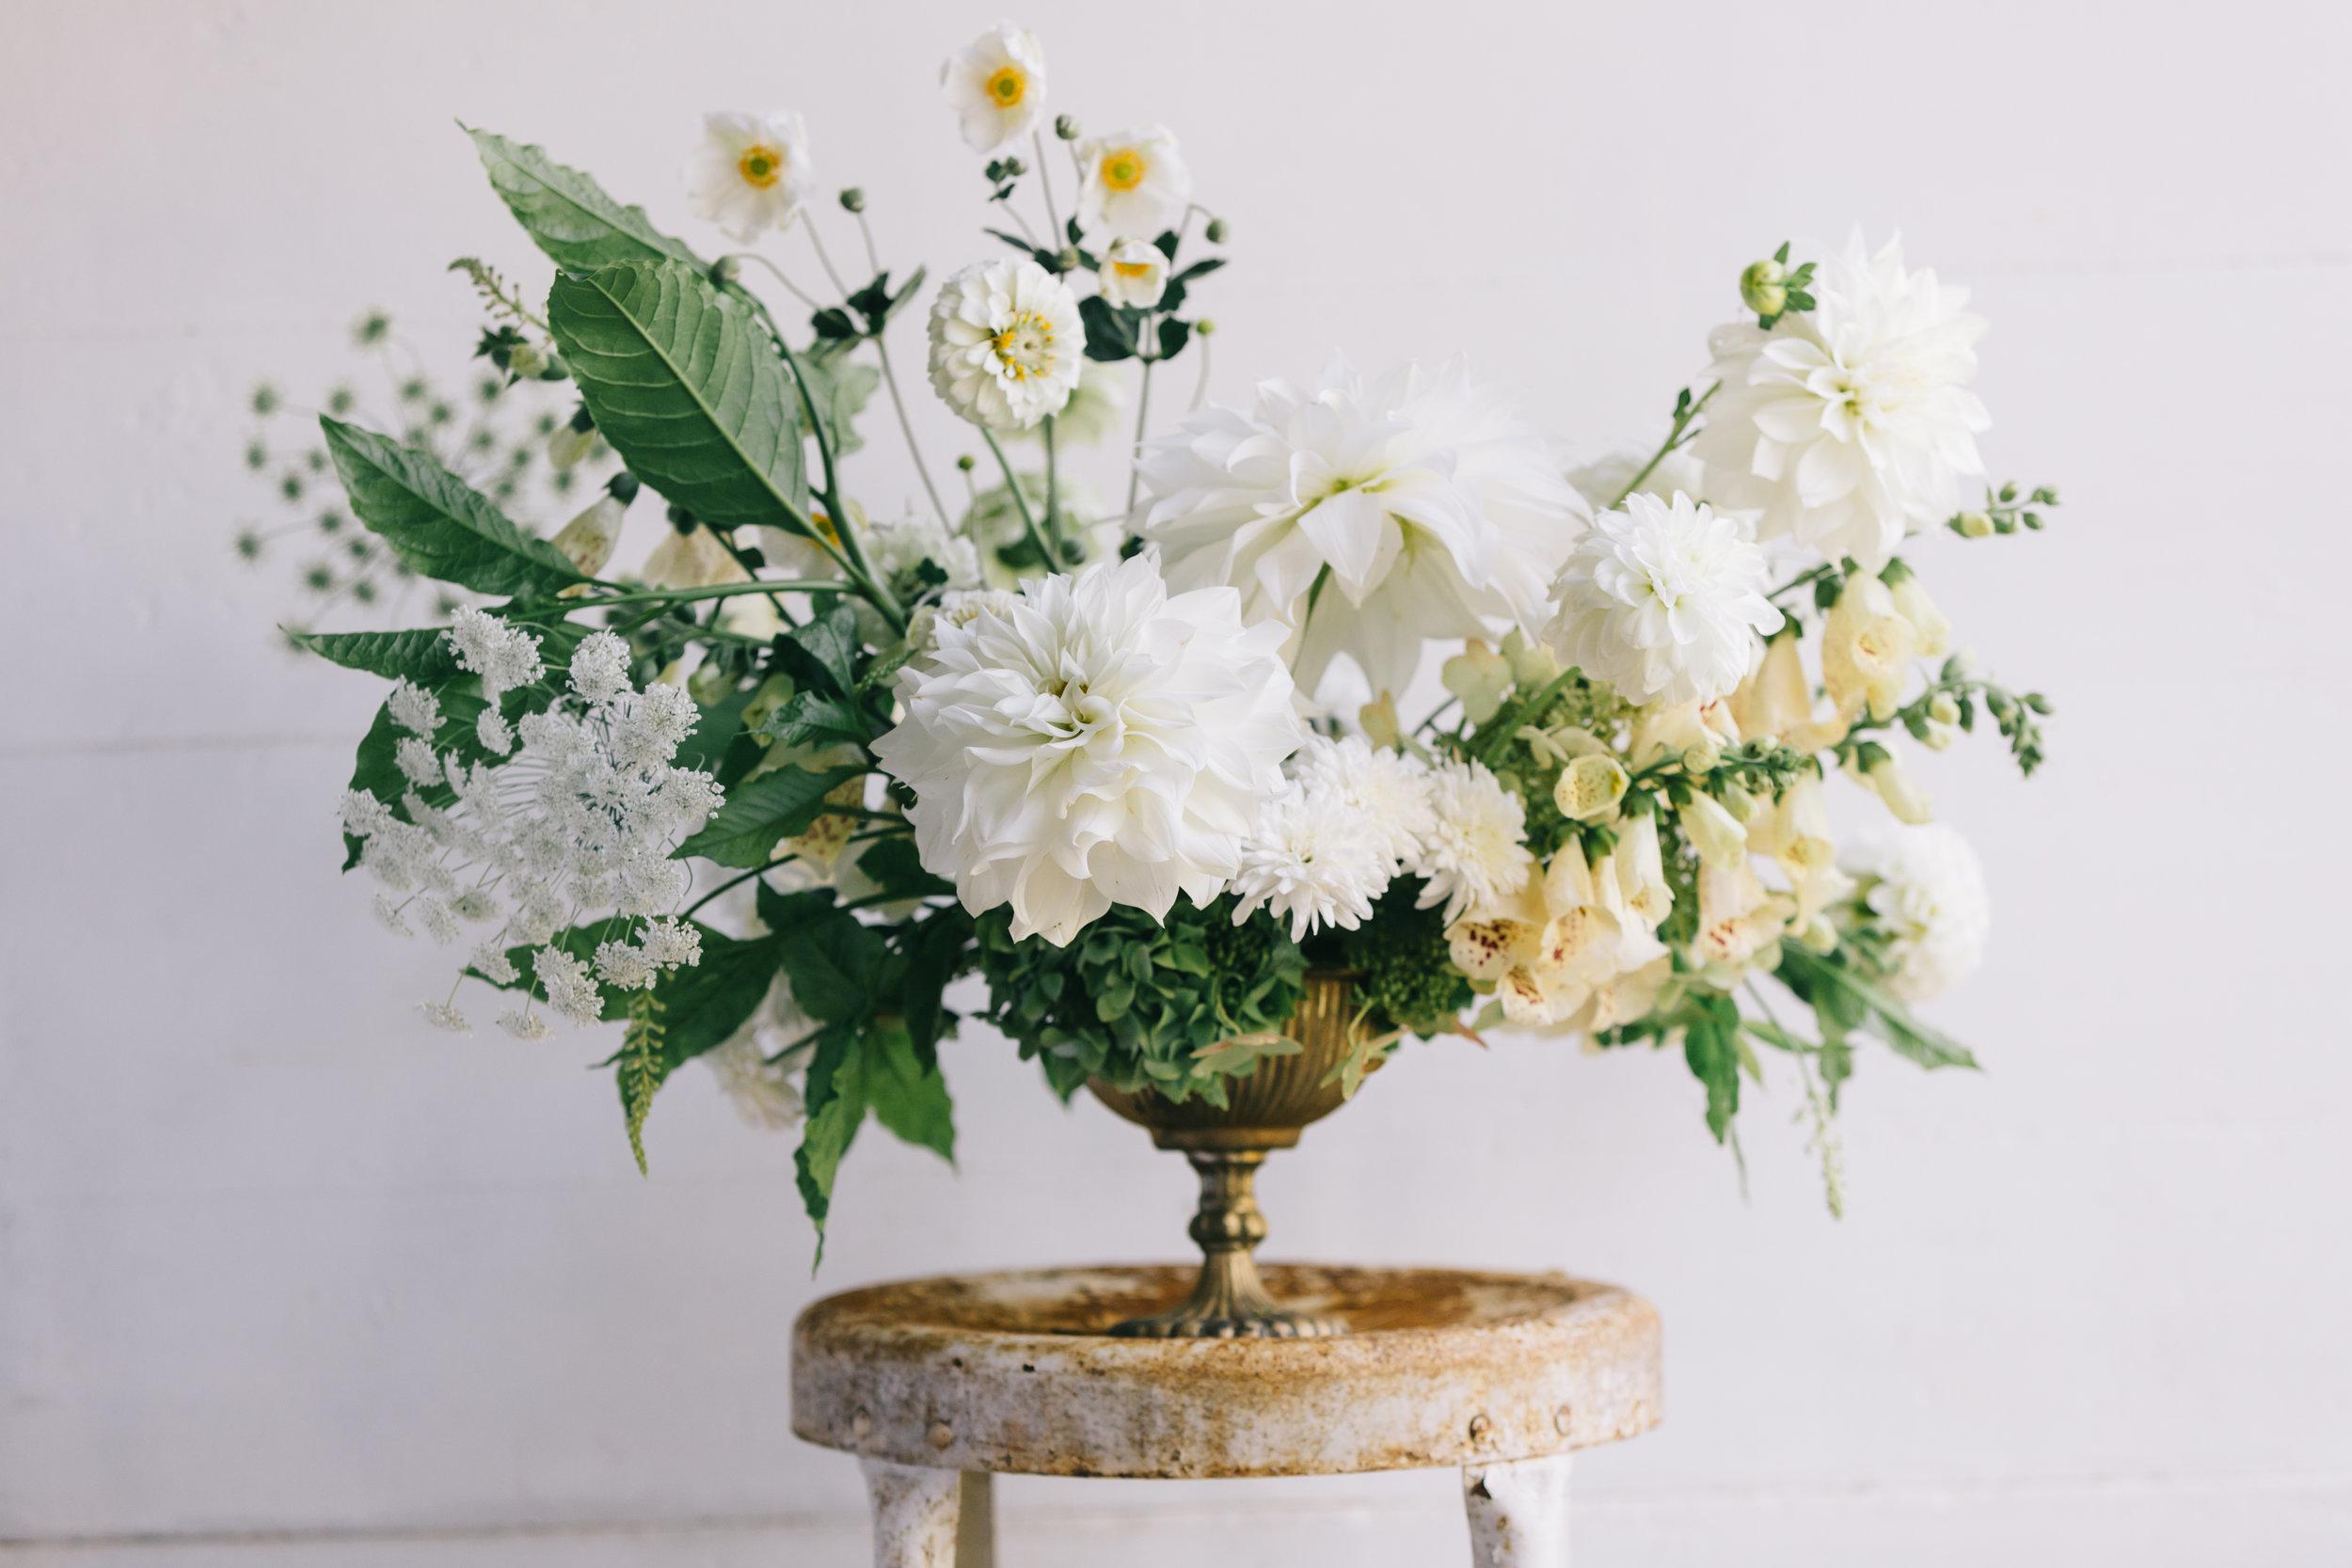 Arrangement by Mandi at Blue Ridge Blooms  Anna Hedges Photography